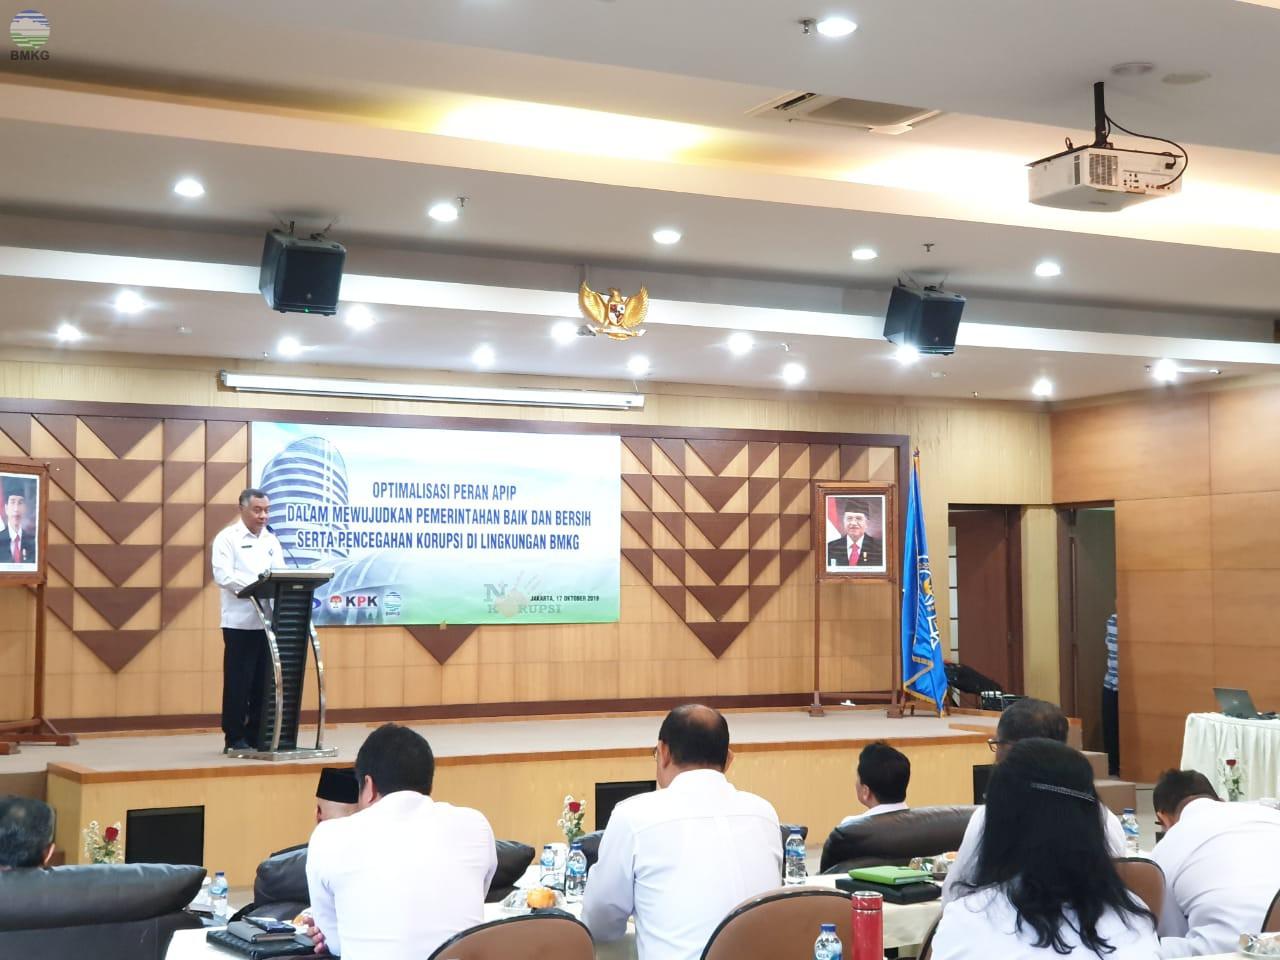 Gelar Pengawasan Inspektorat BMKG Demi Wujudkan Clean and Good Governance